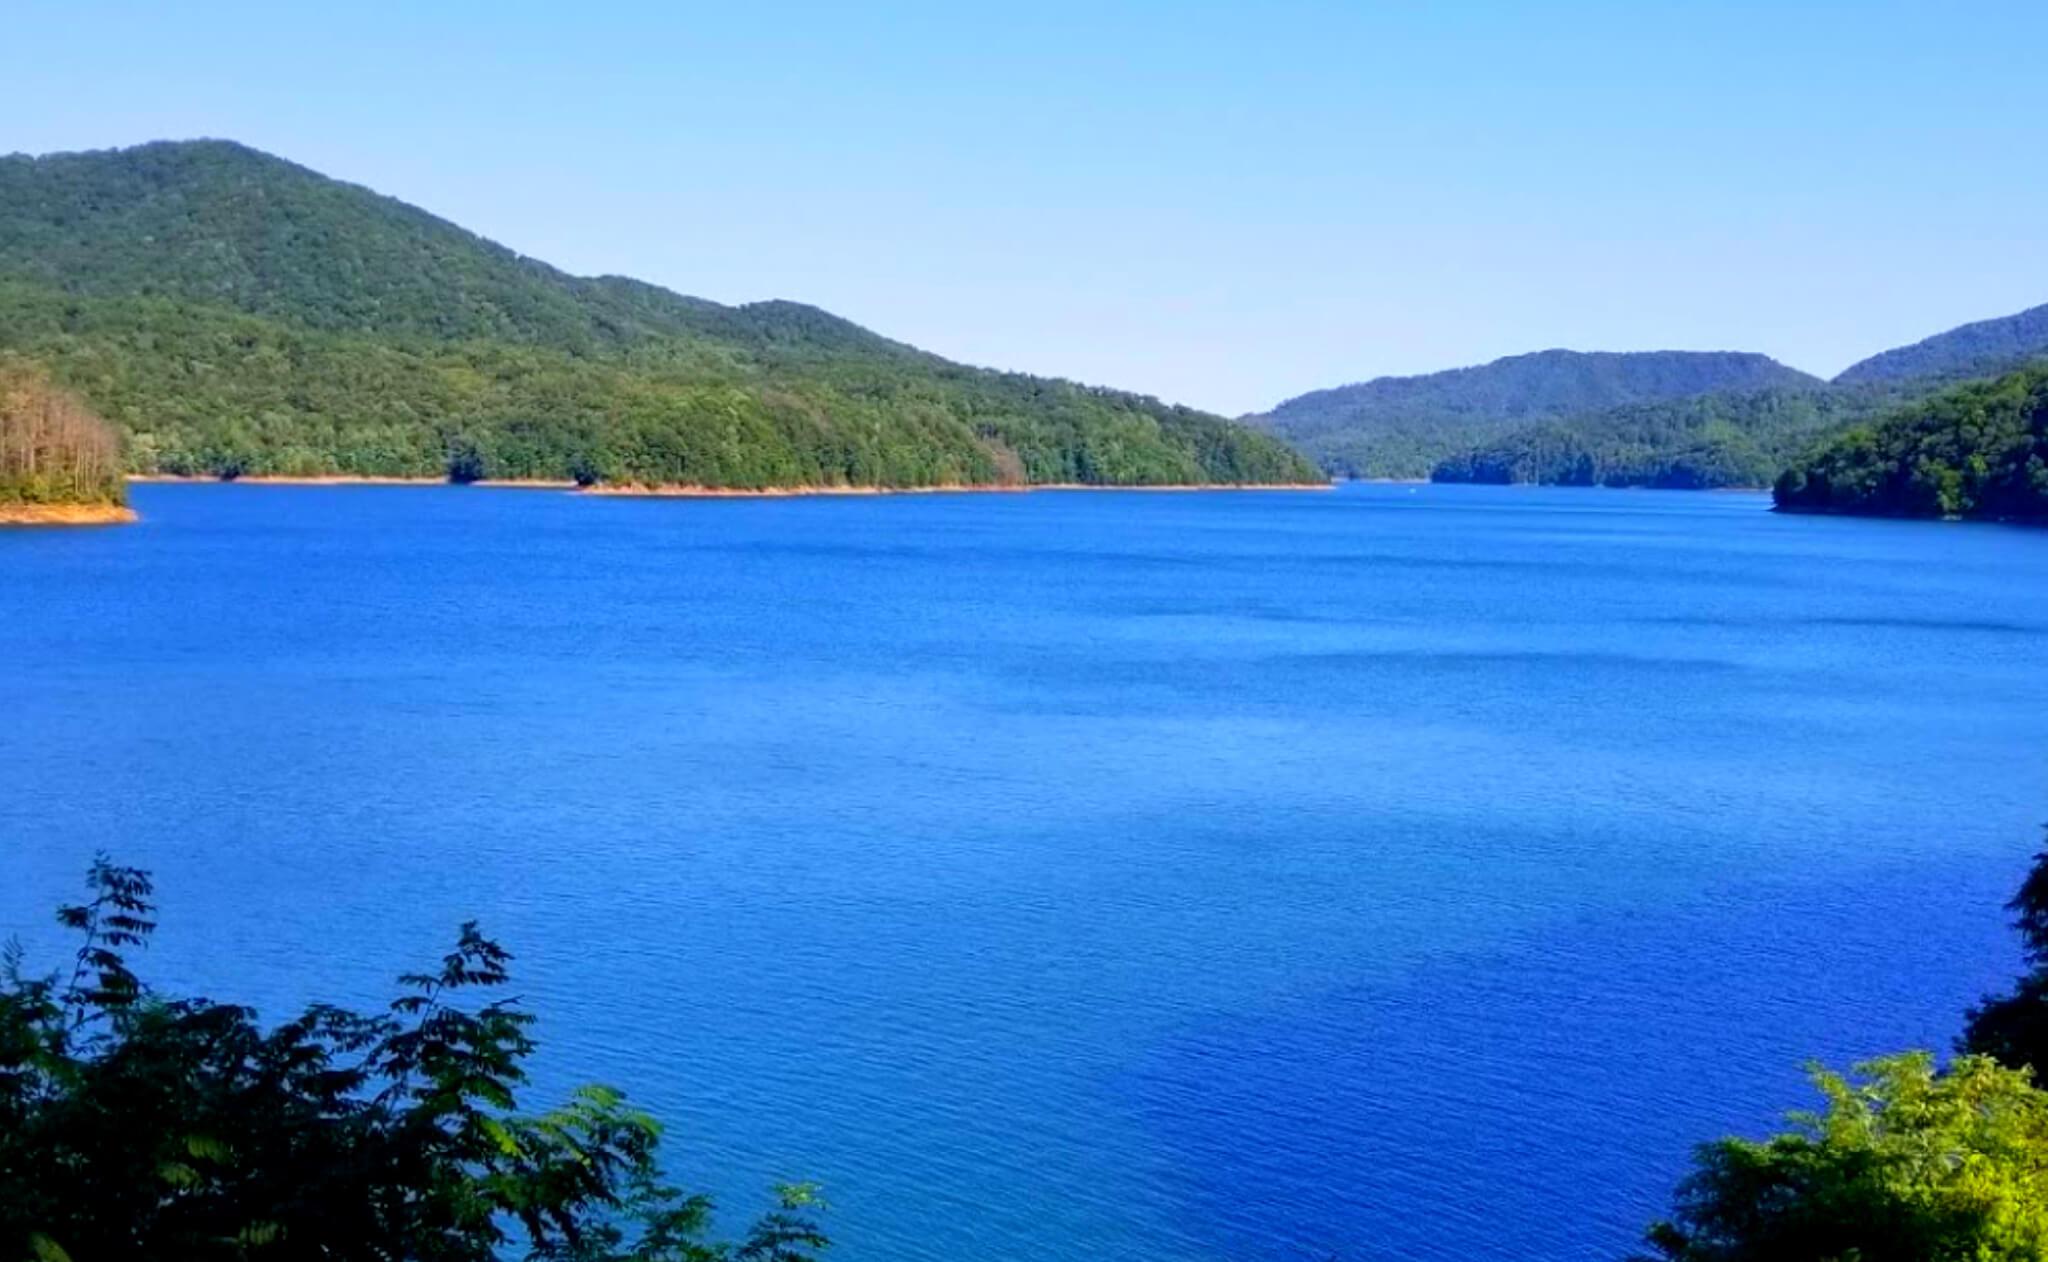 Fontana-Lake-Fishing-Report-Guide-North-Carolina-NC-01